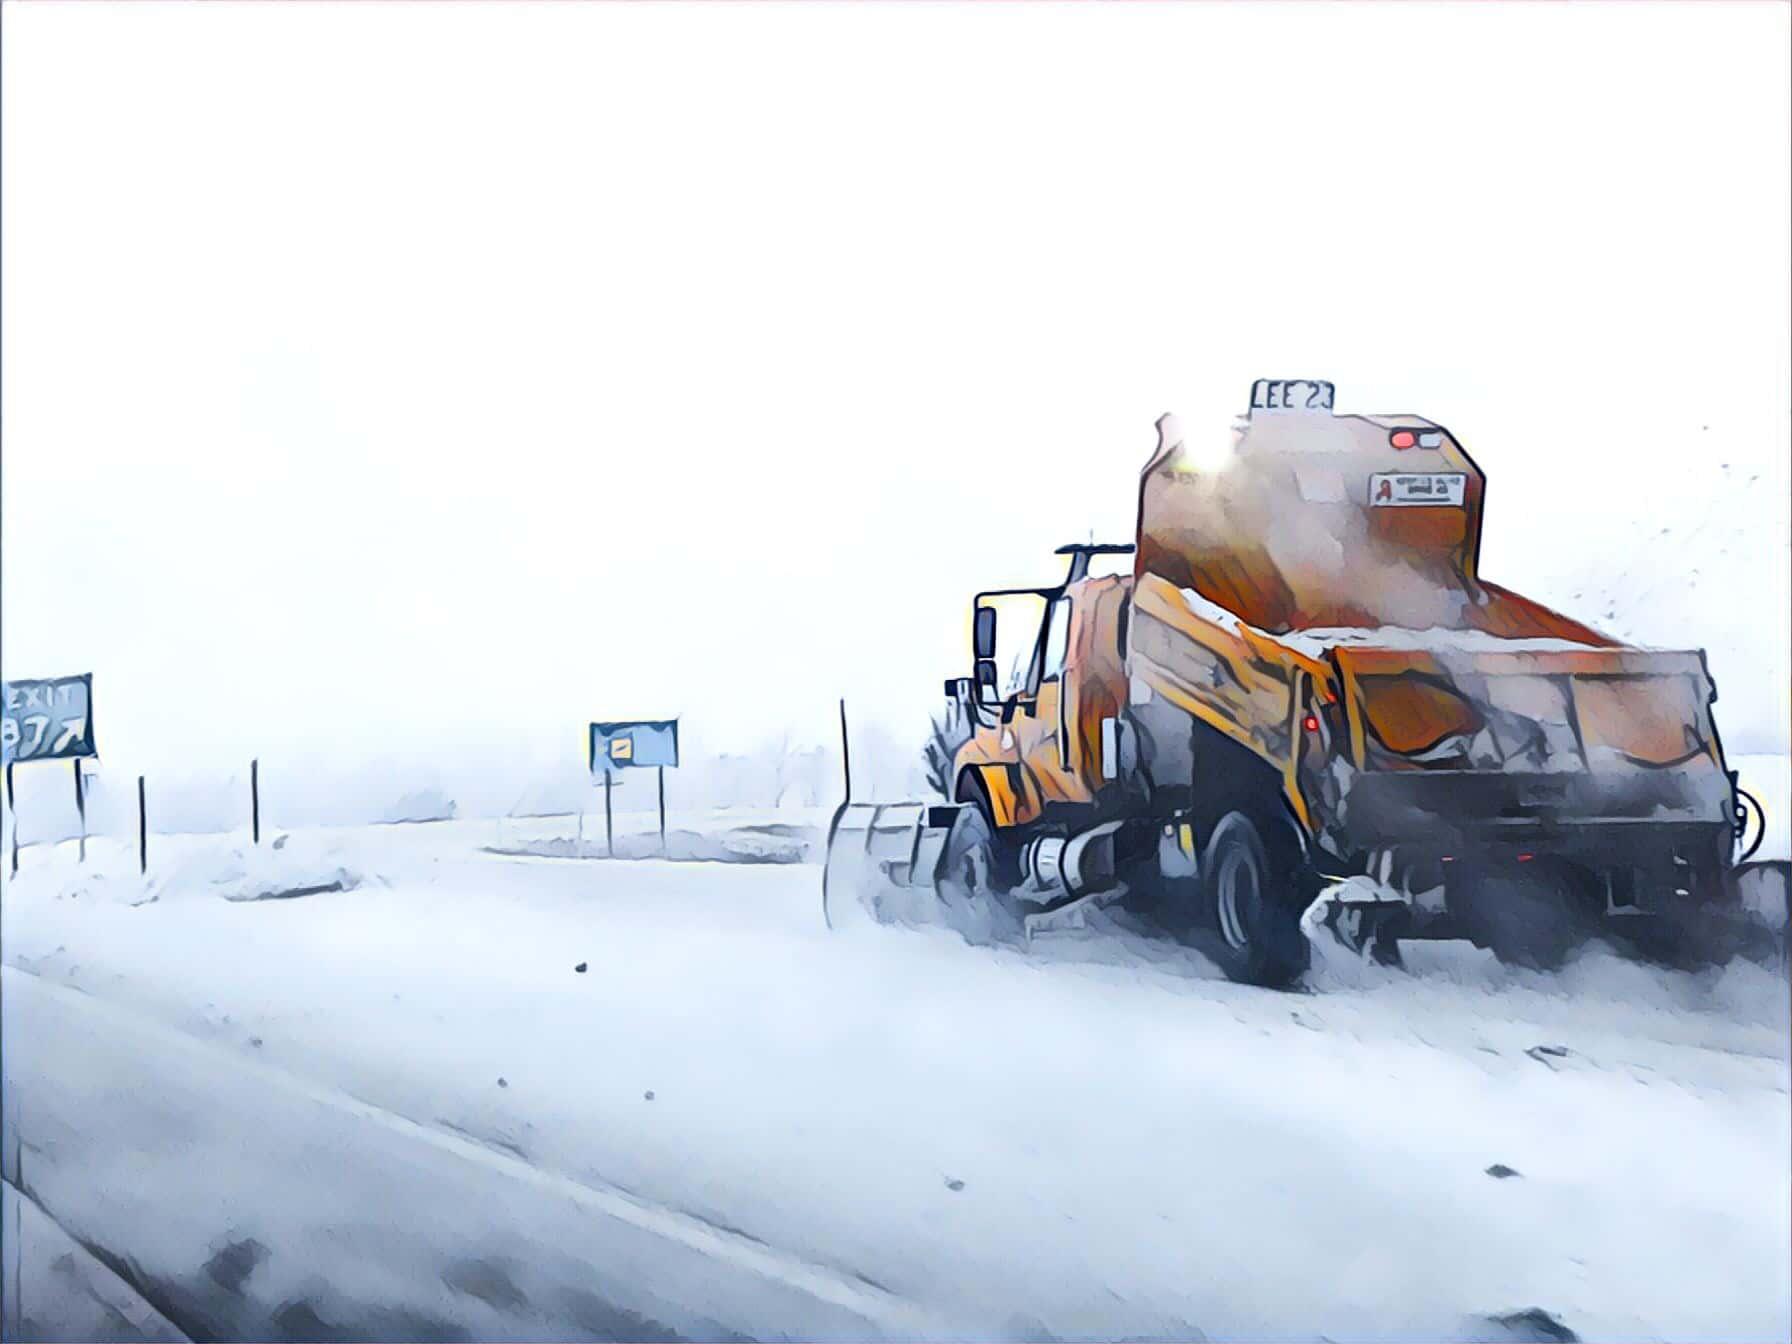 IDOT Snow Plow Salt Truck Winter Road Interstate